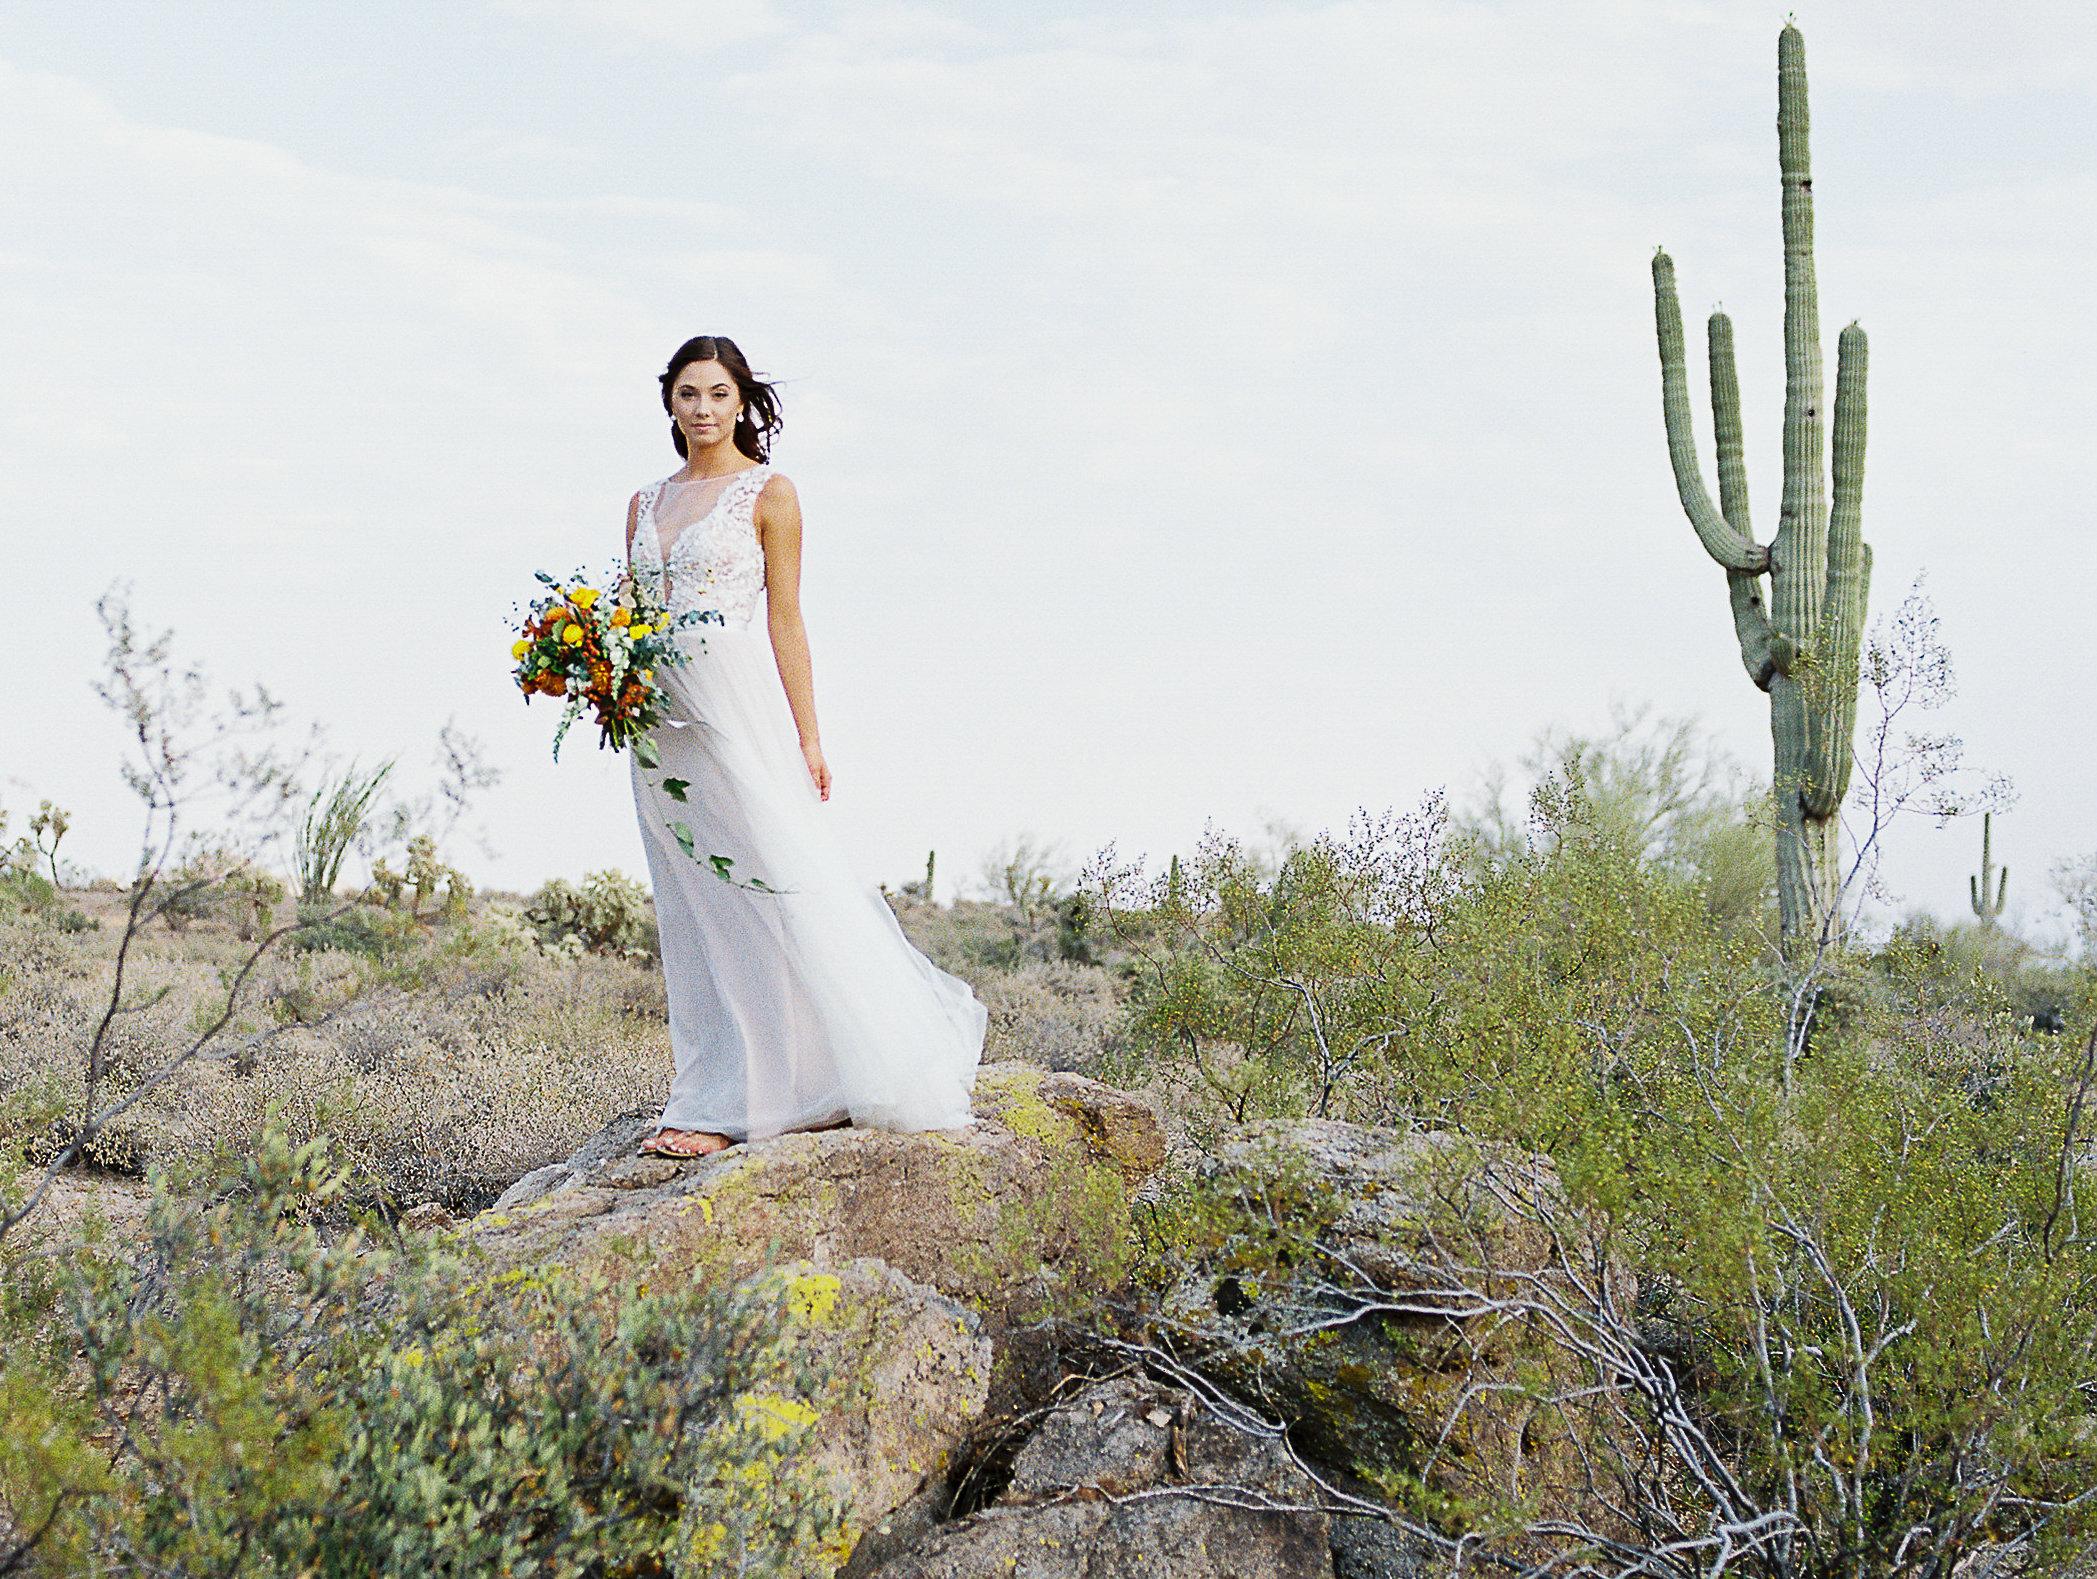 Arizona Geometric Floral Invasion Styled Shoot Featured on 100 Layer Cake - Konsider It Done- AZ Arizona Wedding & Event Planner, Designer, Coordinator Planning in Scottsdale, Phoenix, Paradise Valley, Tempe, Gilbert, Mesa, Chandler, Tucson, Sedona